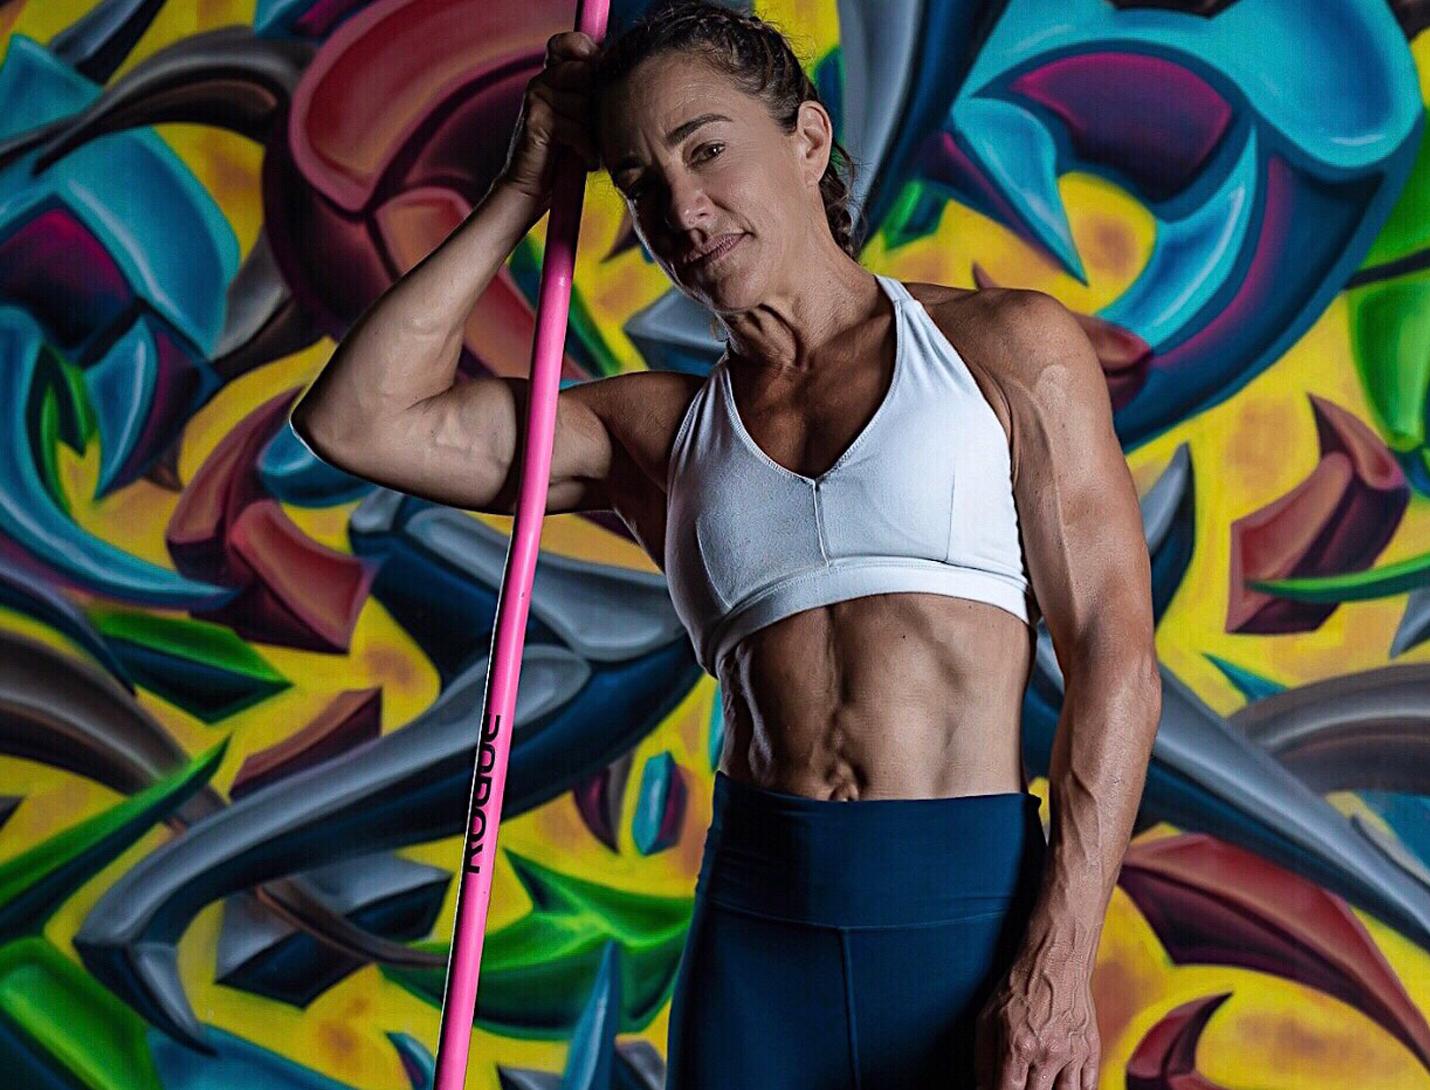 Trainer Hilary Rifkin